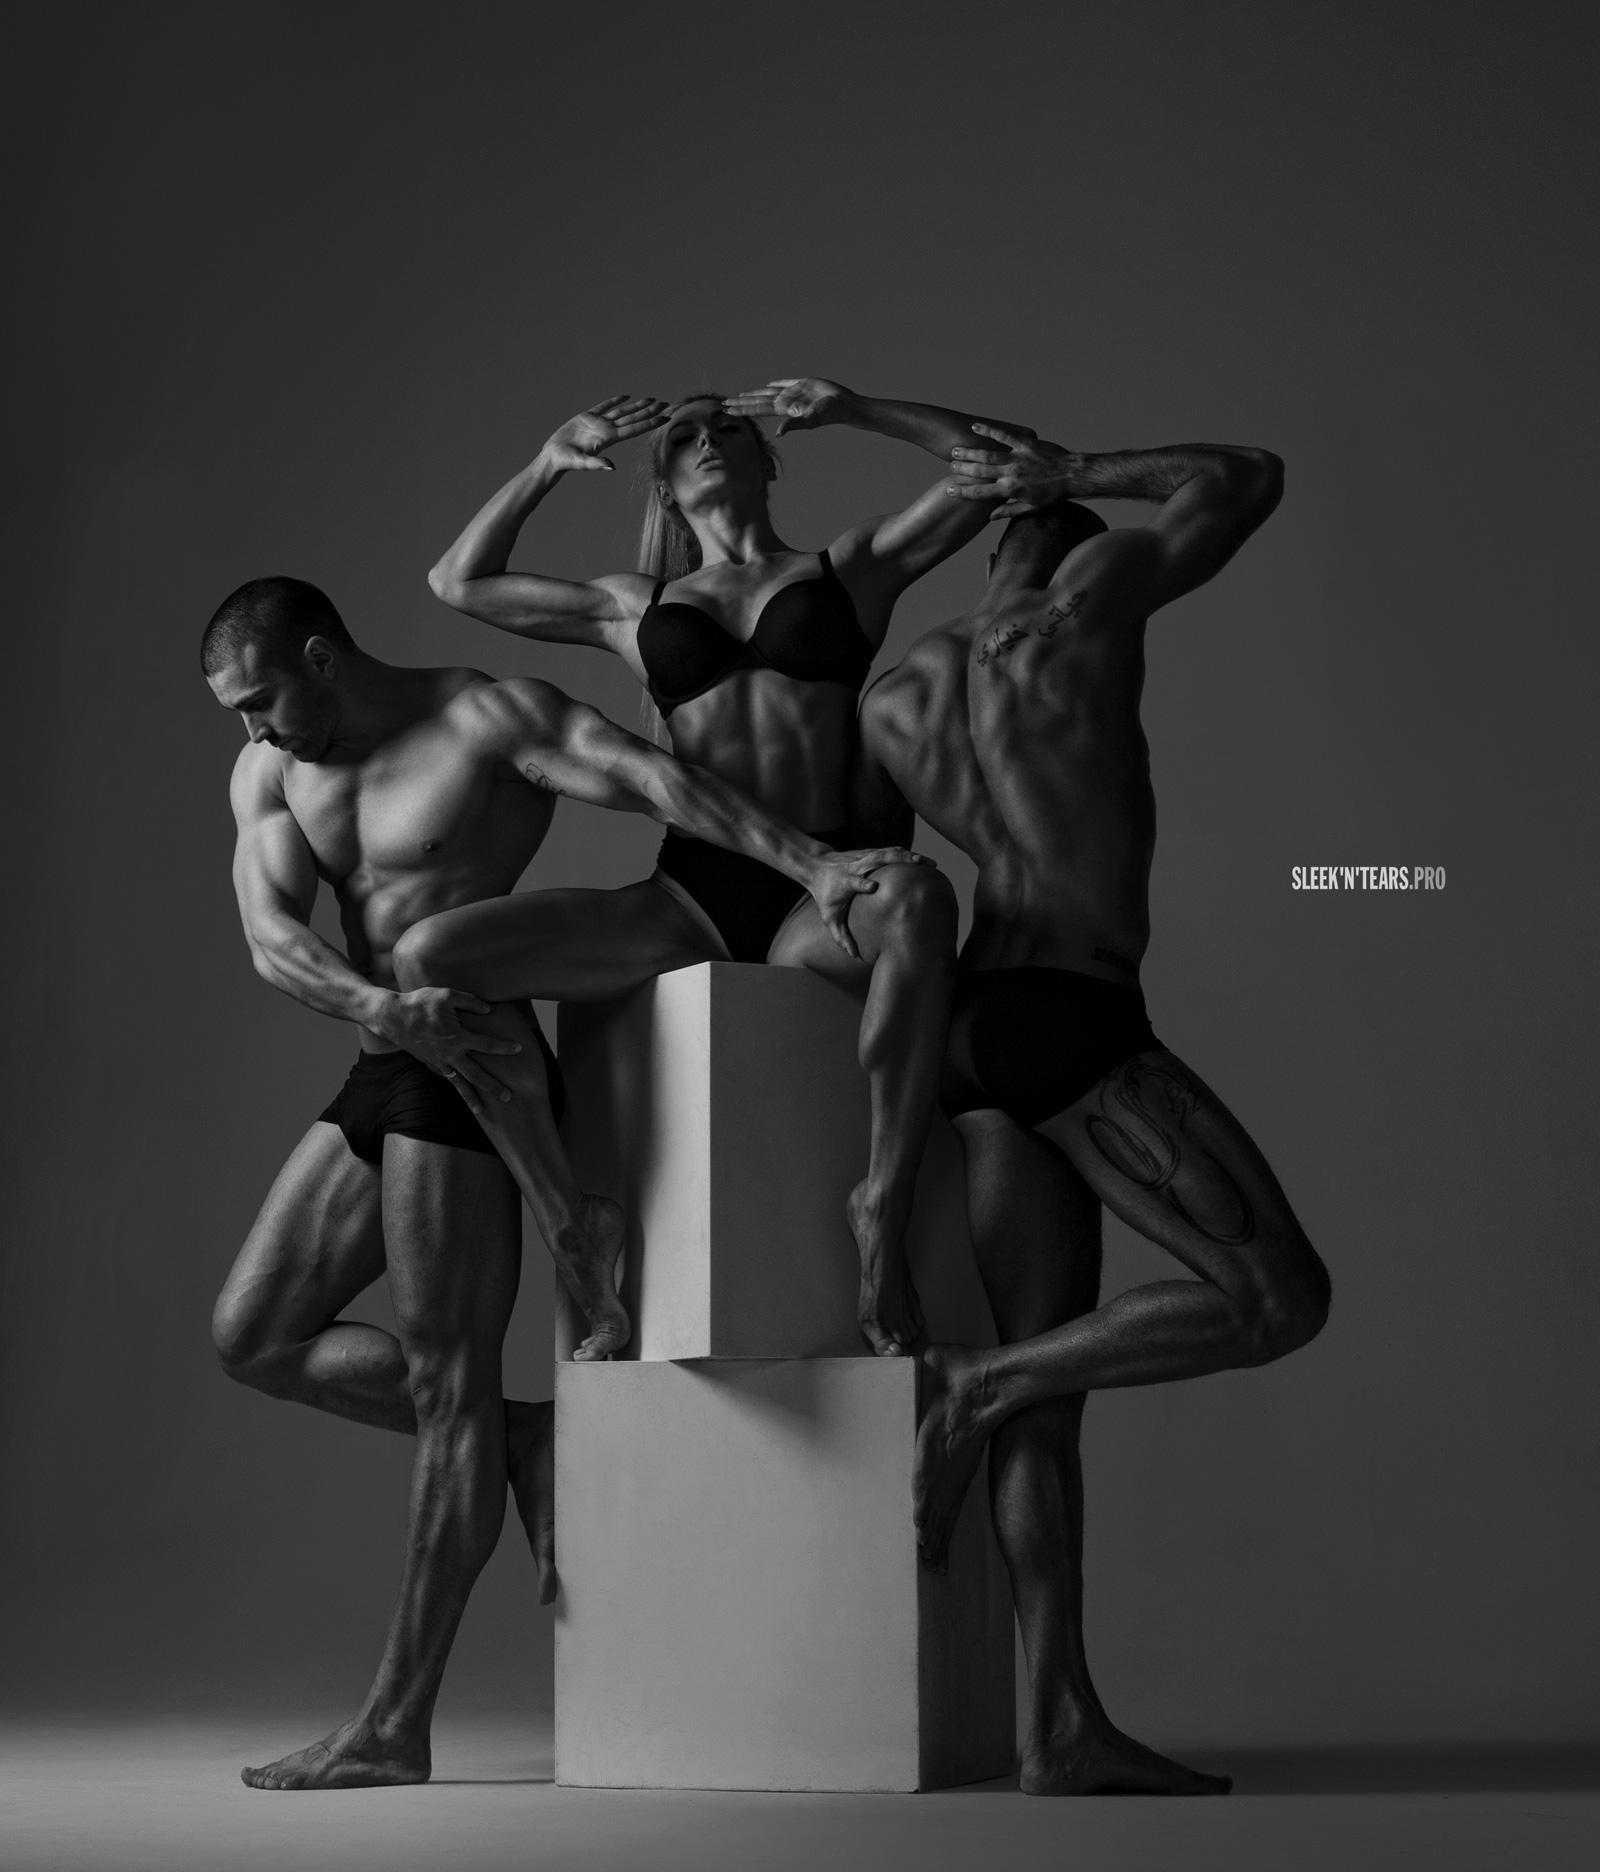 Проект фотохудожника Кристы Судмалис © SLEEK'N'TEARS